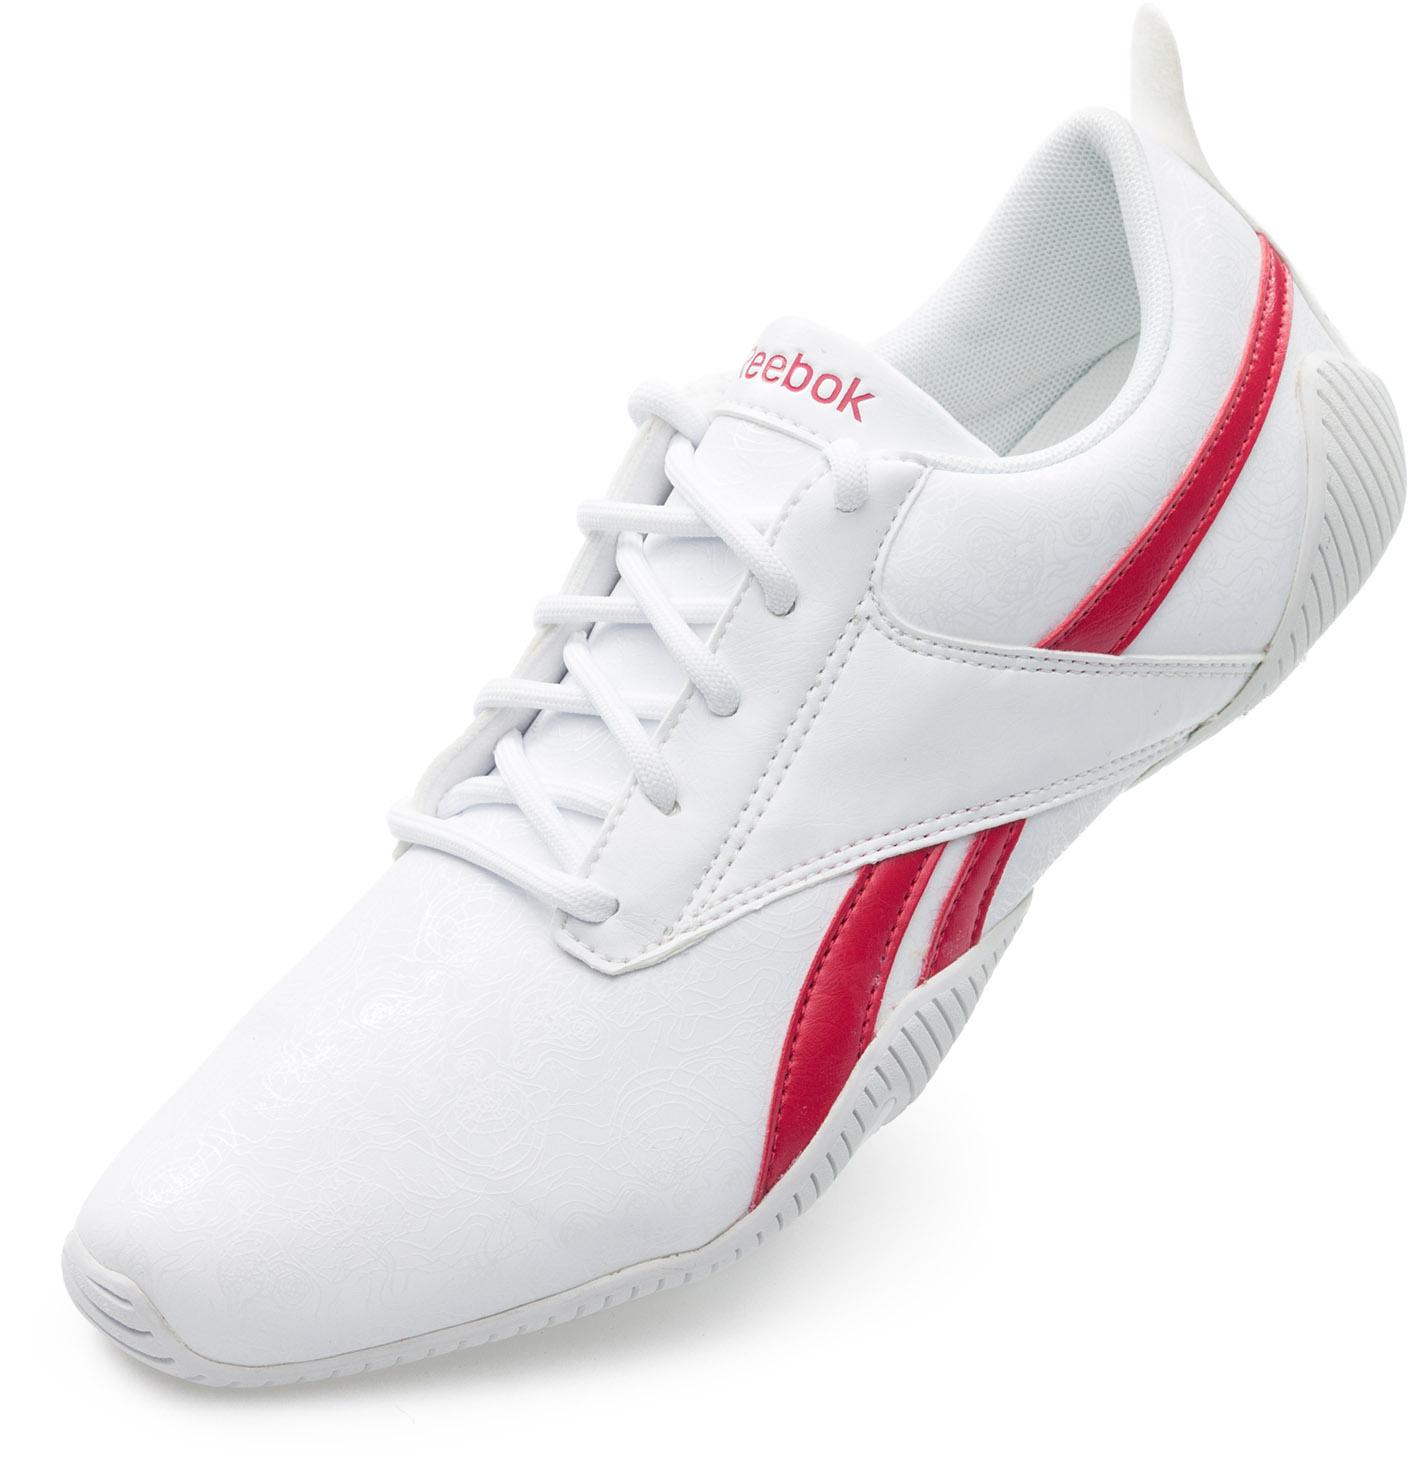 Sportovní obuv Reebok Reedance